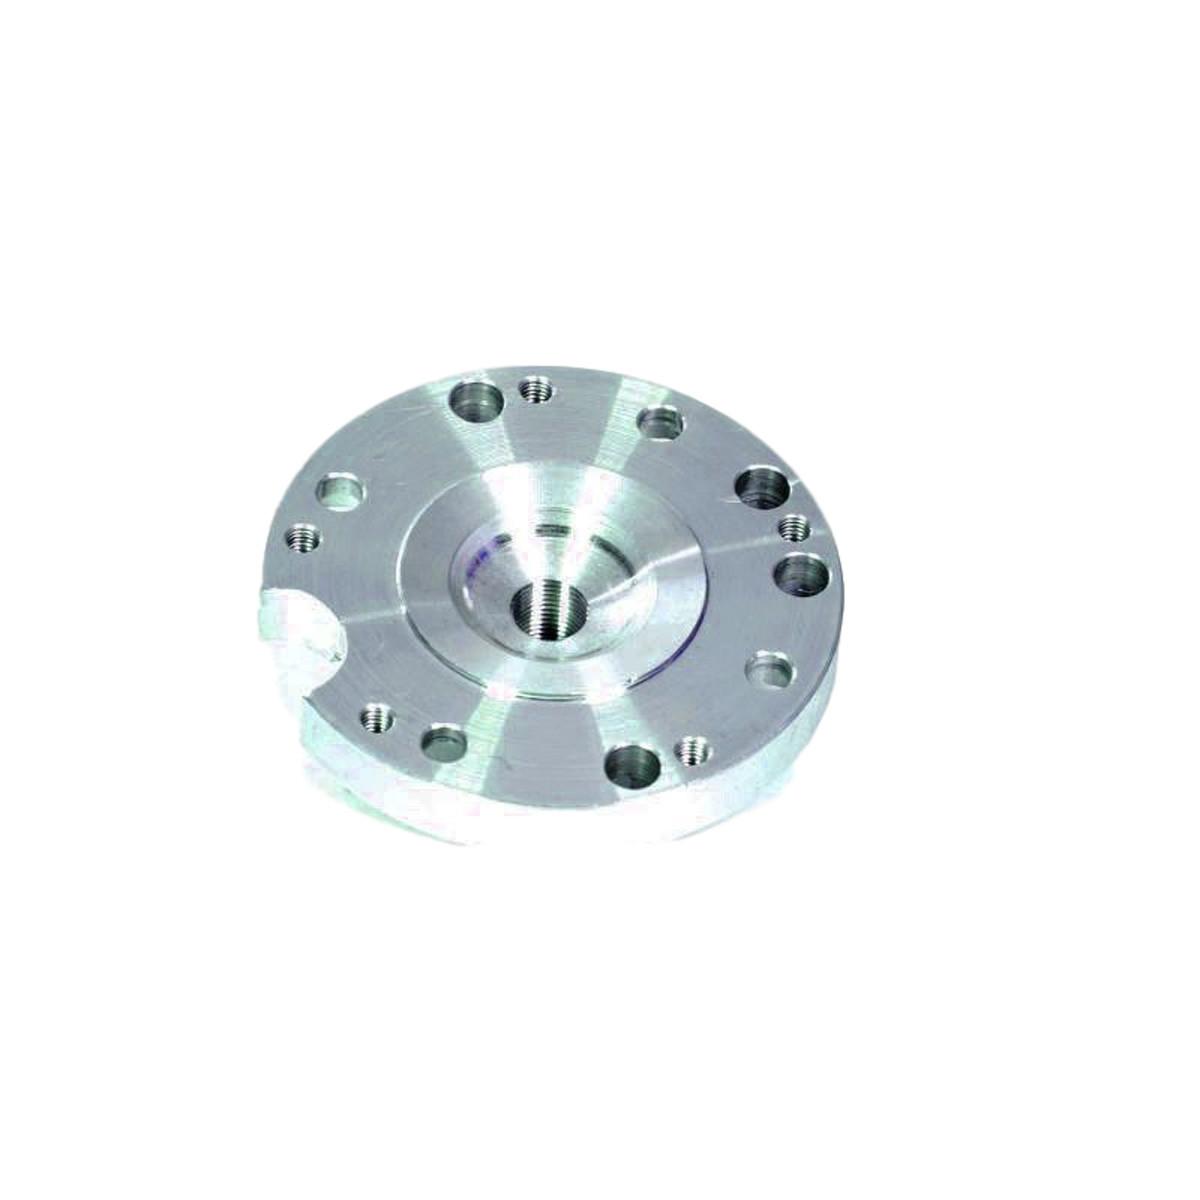 Plot de Culasse AM6 50,6mm - MVT